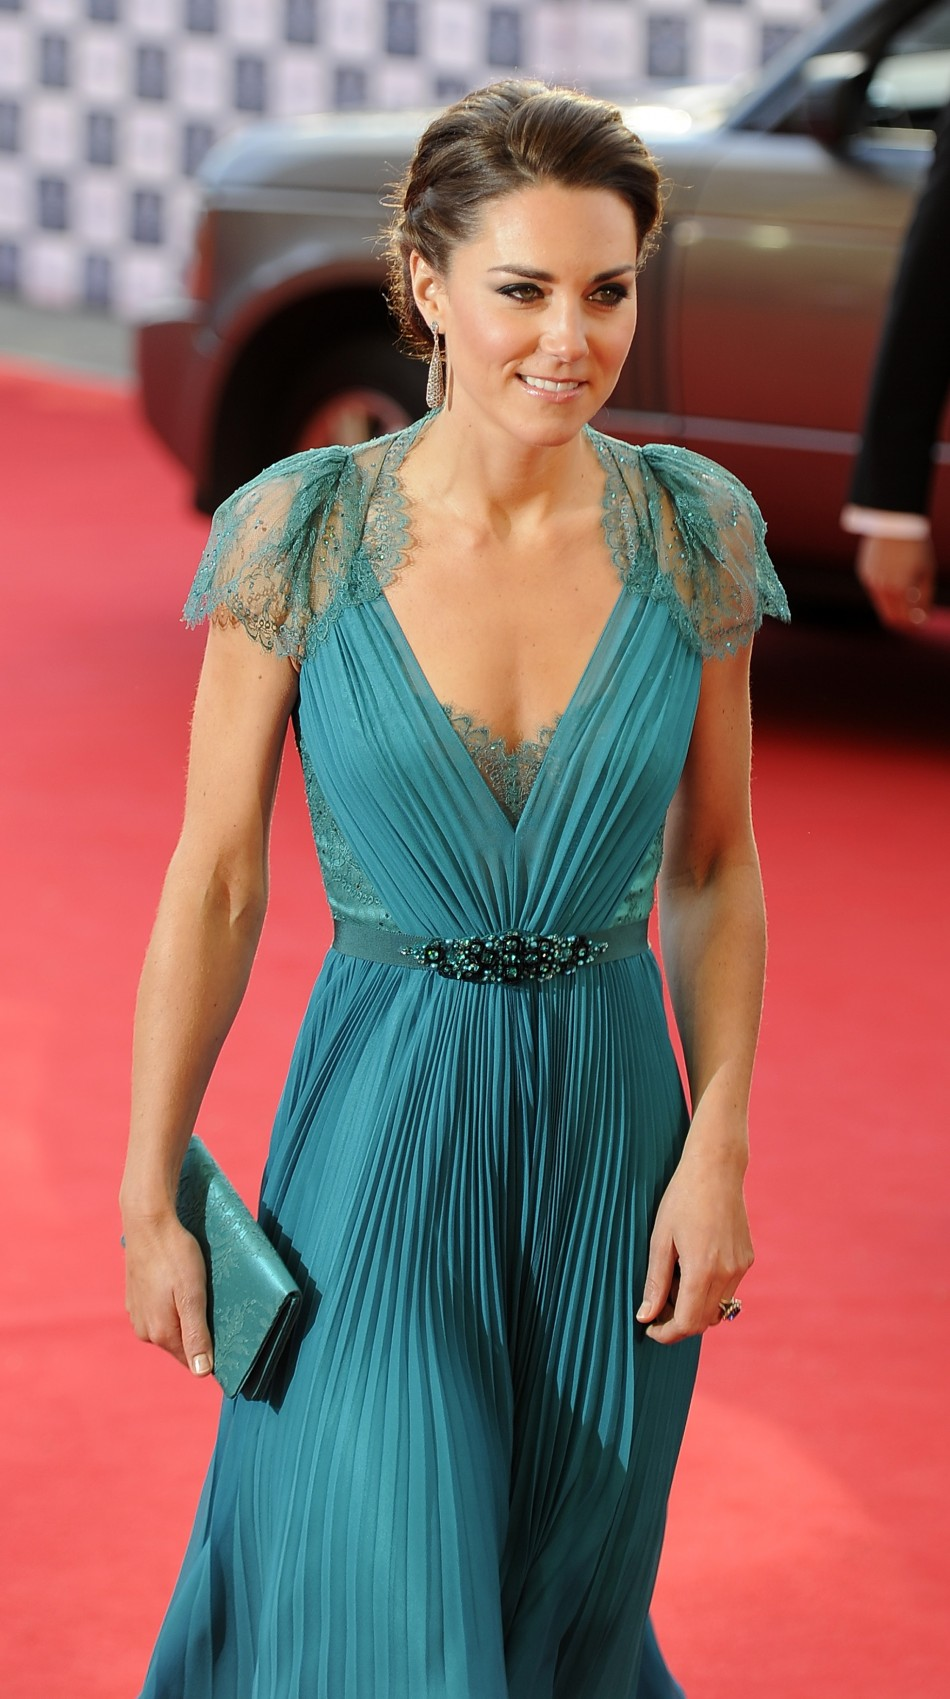 Kate Middleton has got her figure back